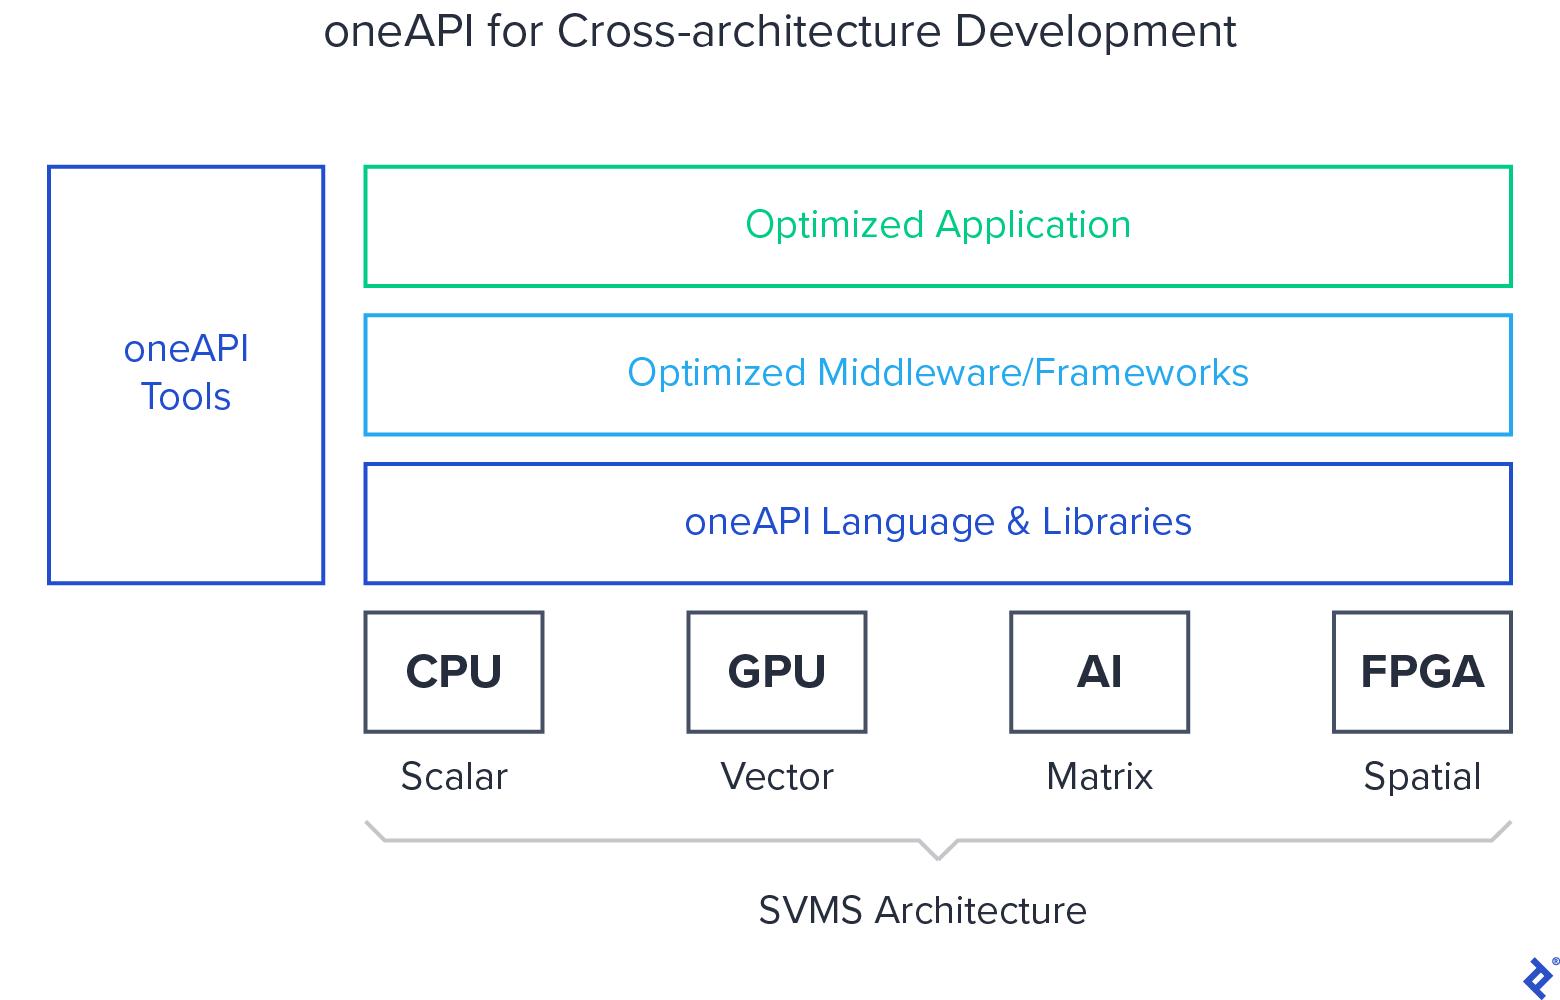 oneAPI for Cross-architecture Development